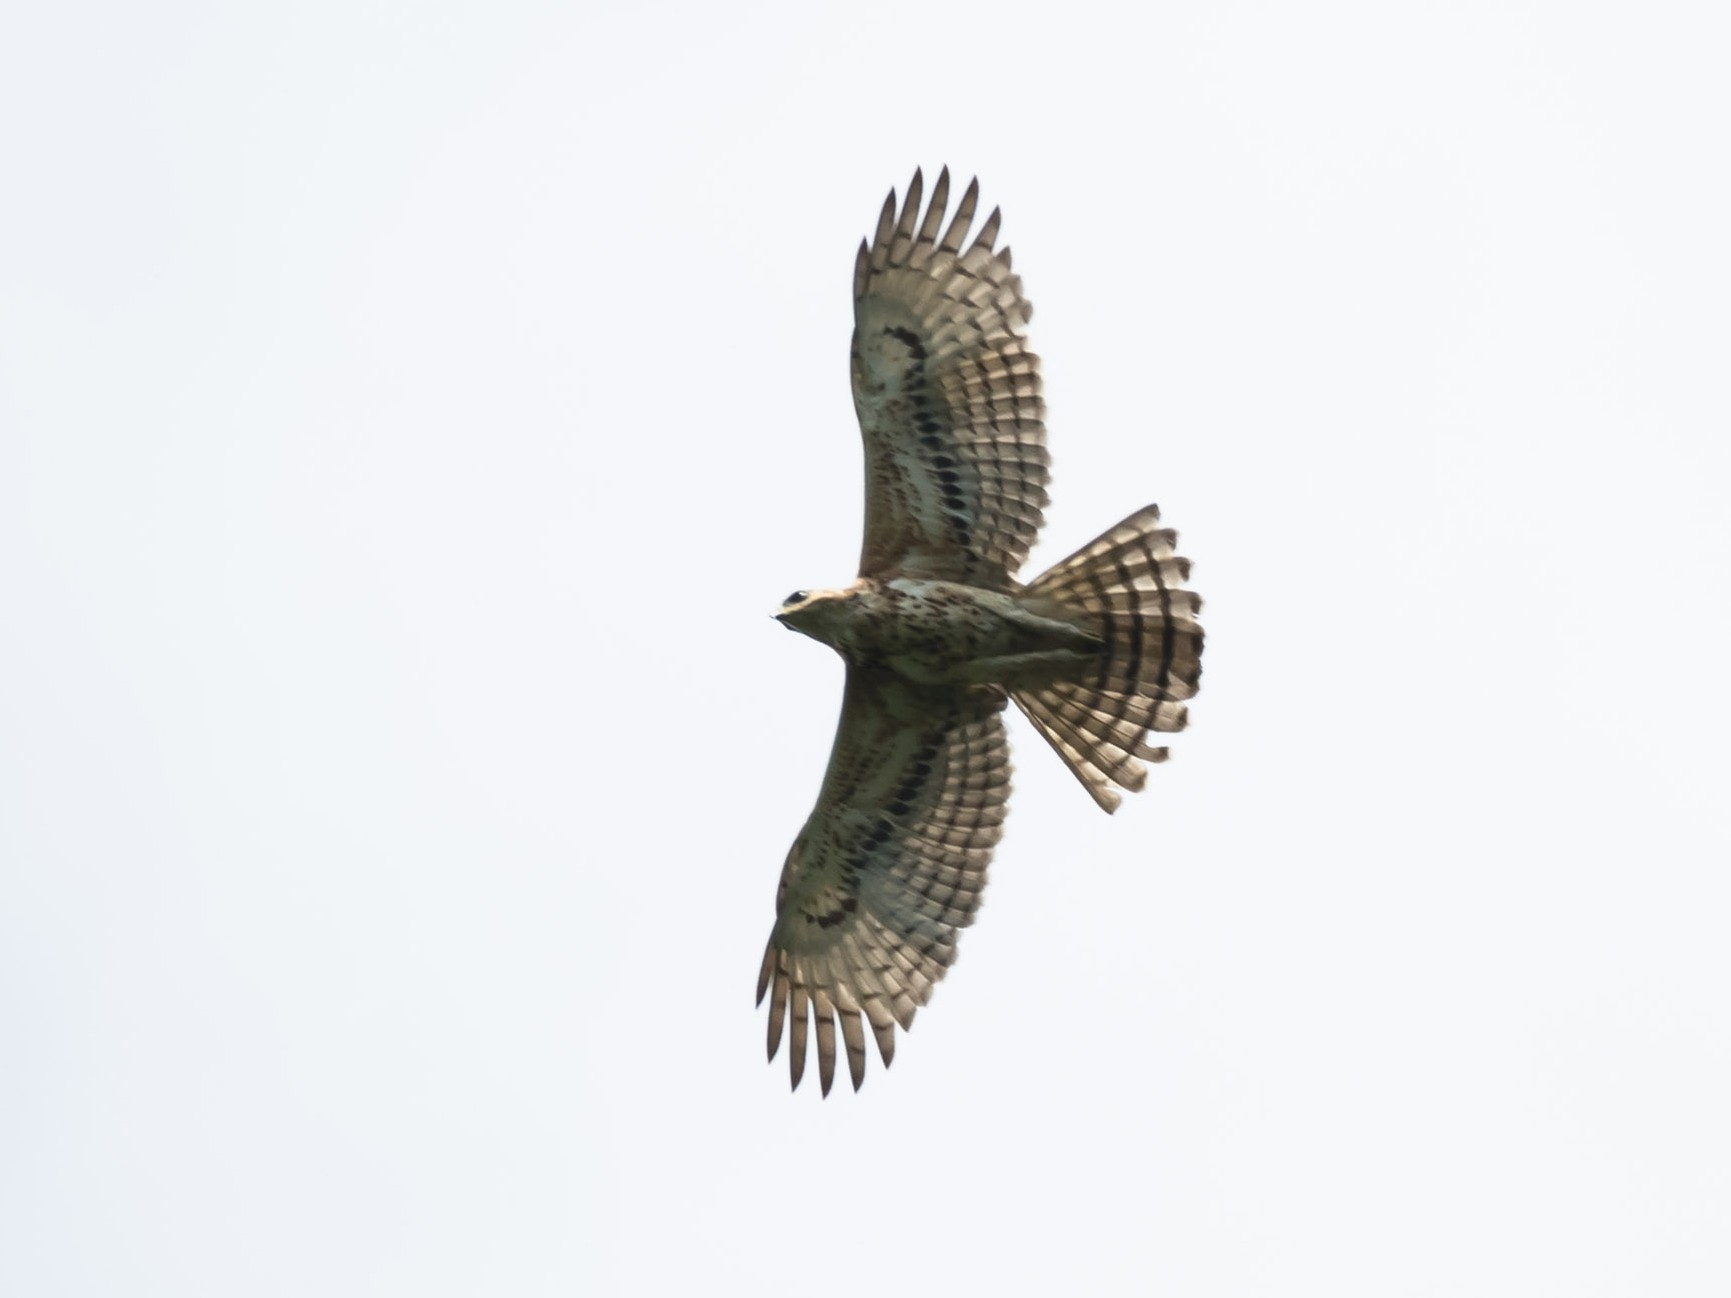 Cassin's Hawk-Eagle - Eric francois Roualet